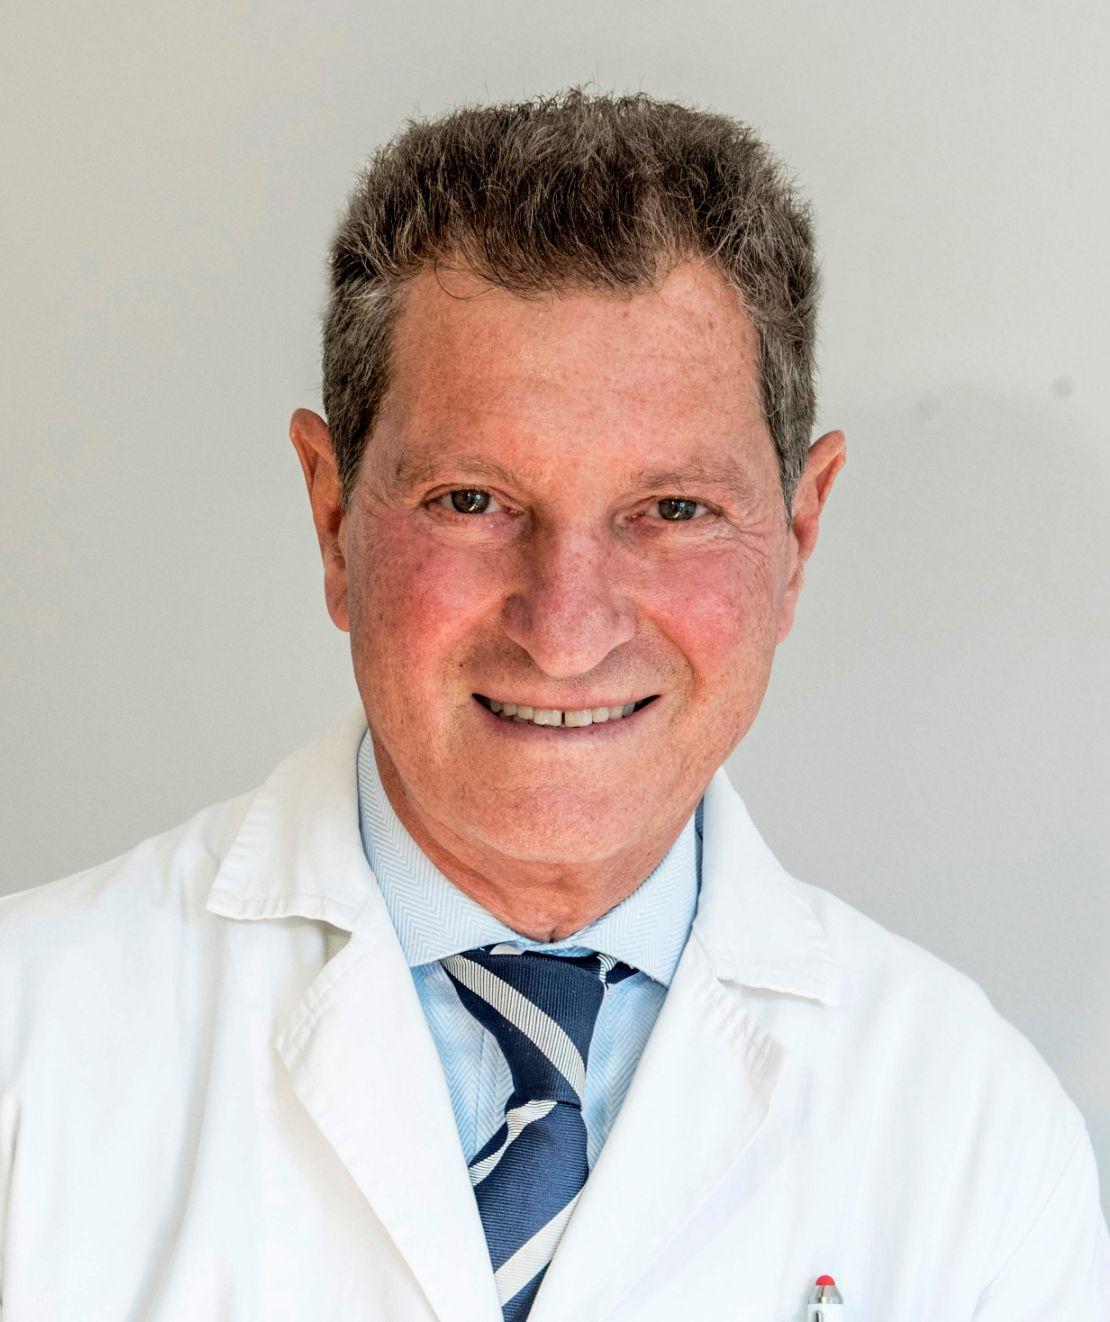 Guido Strada